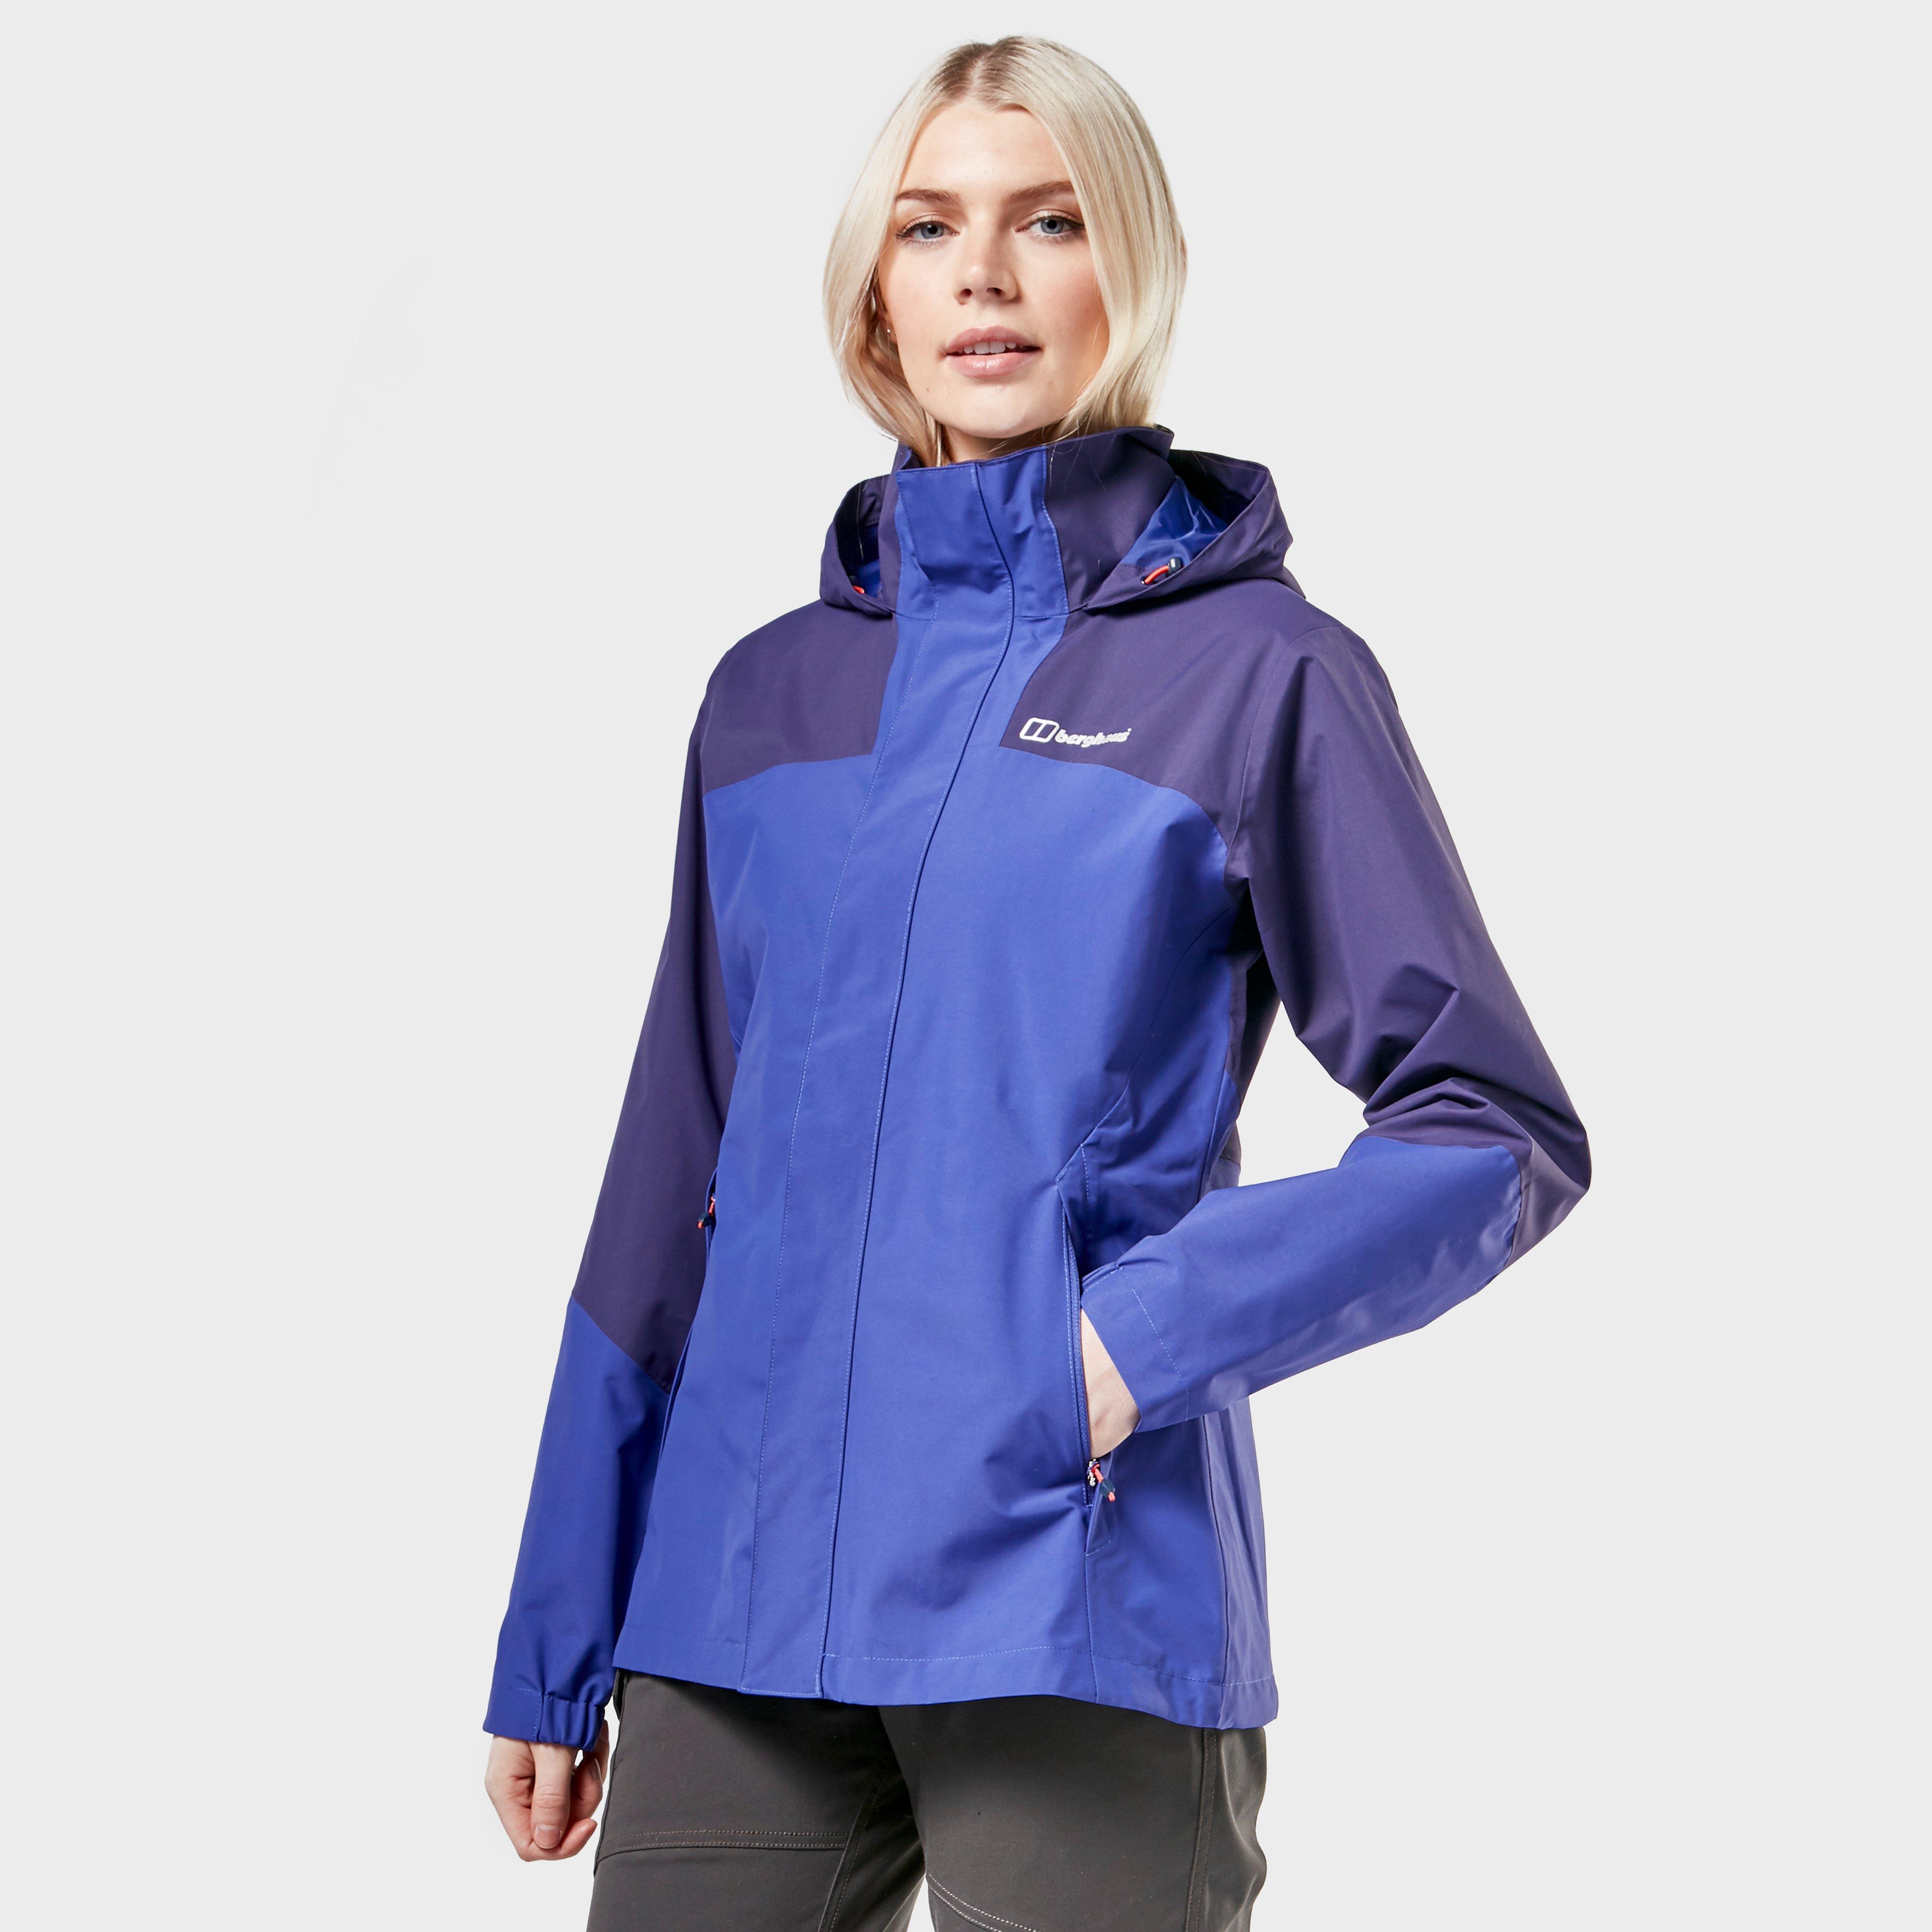 Berghaus Berghaus womens Orestina Waterproof Jacket, Purple